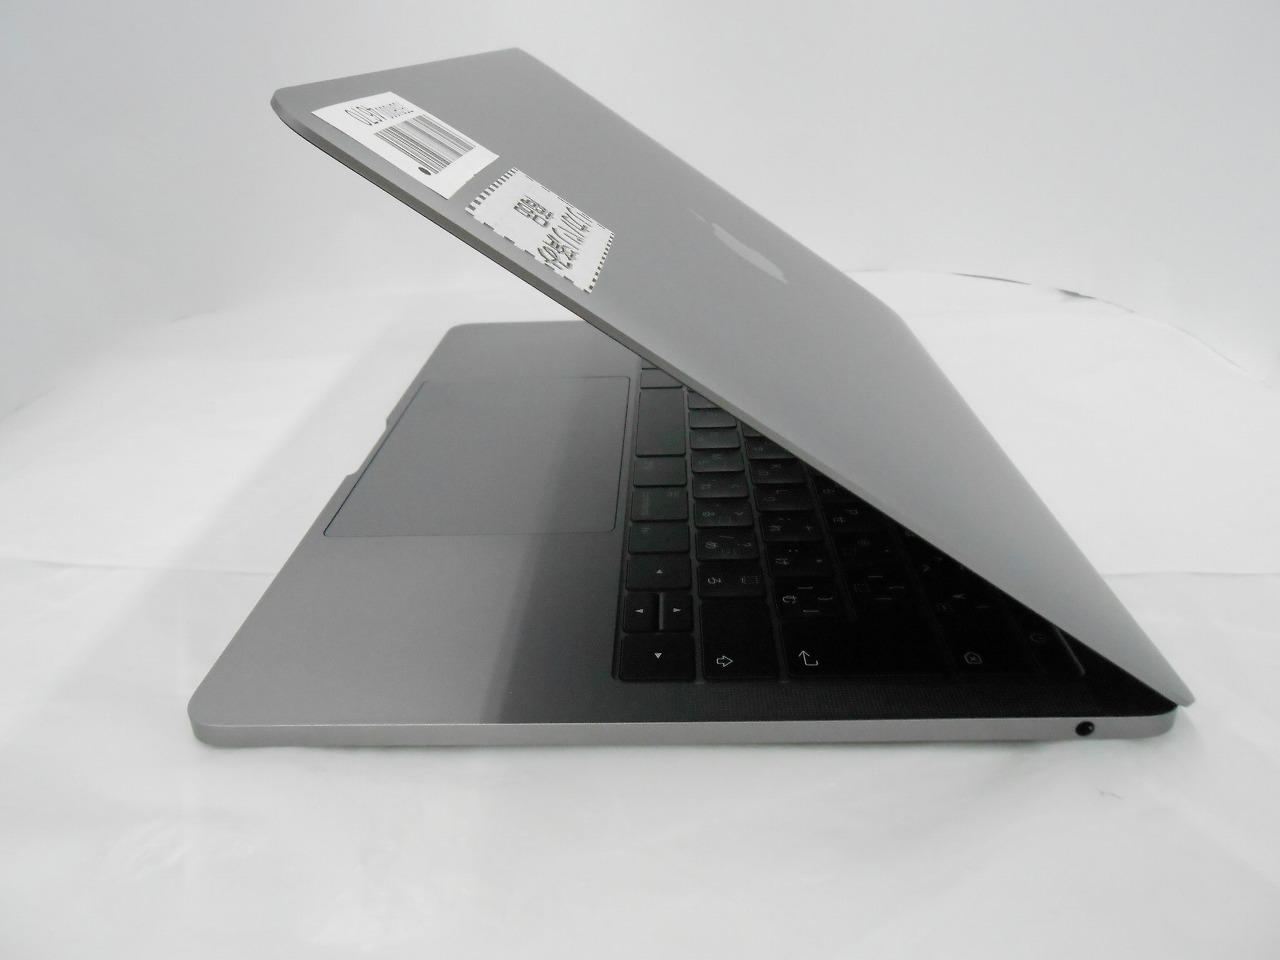 Aランク【中古】 Apple MacBookPro MPXQ2J/A /Mid2017/Corei5 2.3GHz/メモリ8GB/SSD128GB/13インチ/Mac OS X High Sierra 10.13.6【3ヶ月保証】【足立店発送】